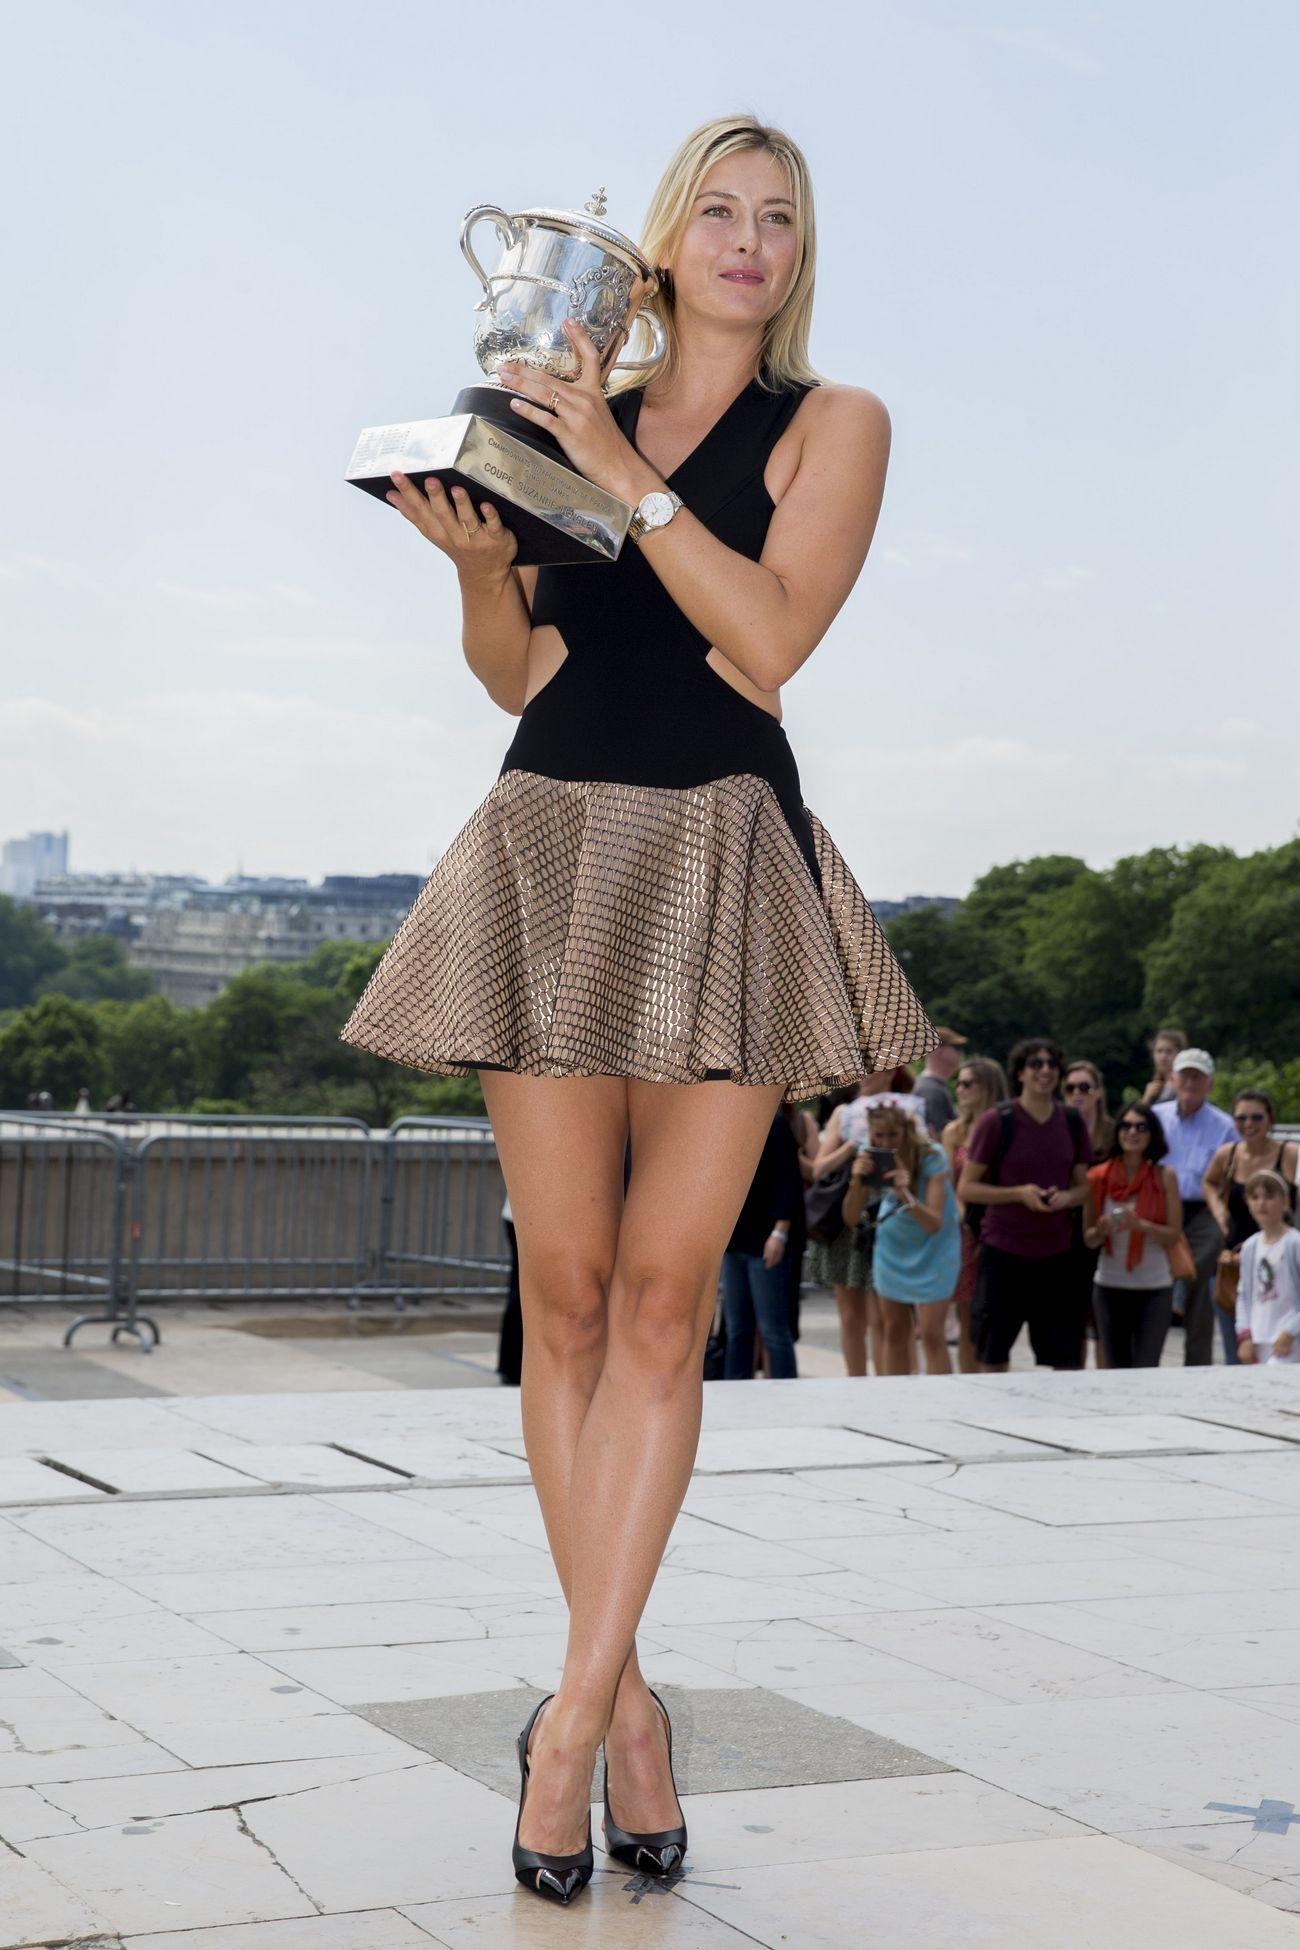 Sharapova Russa beleza de mulher